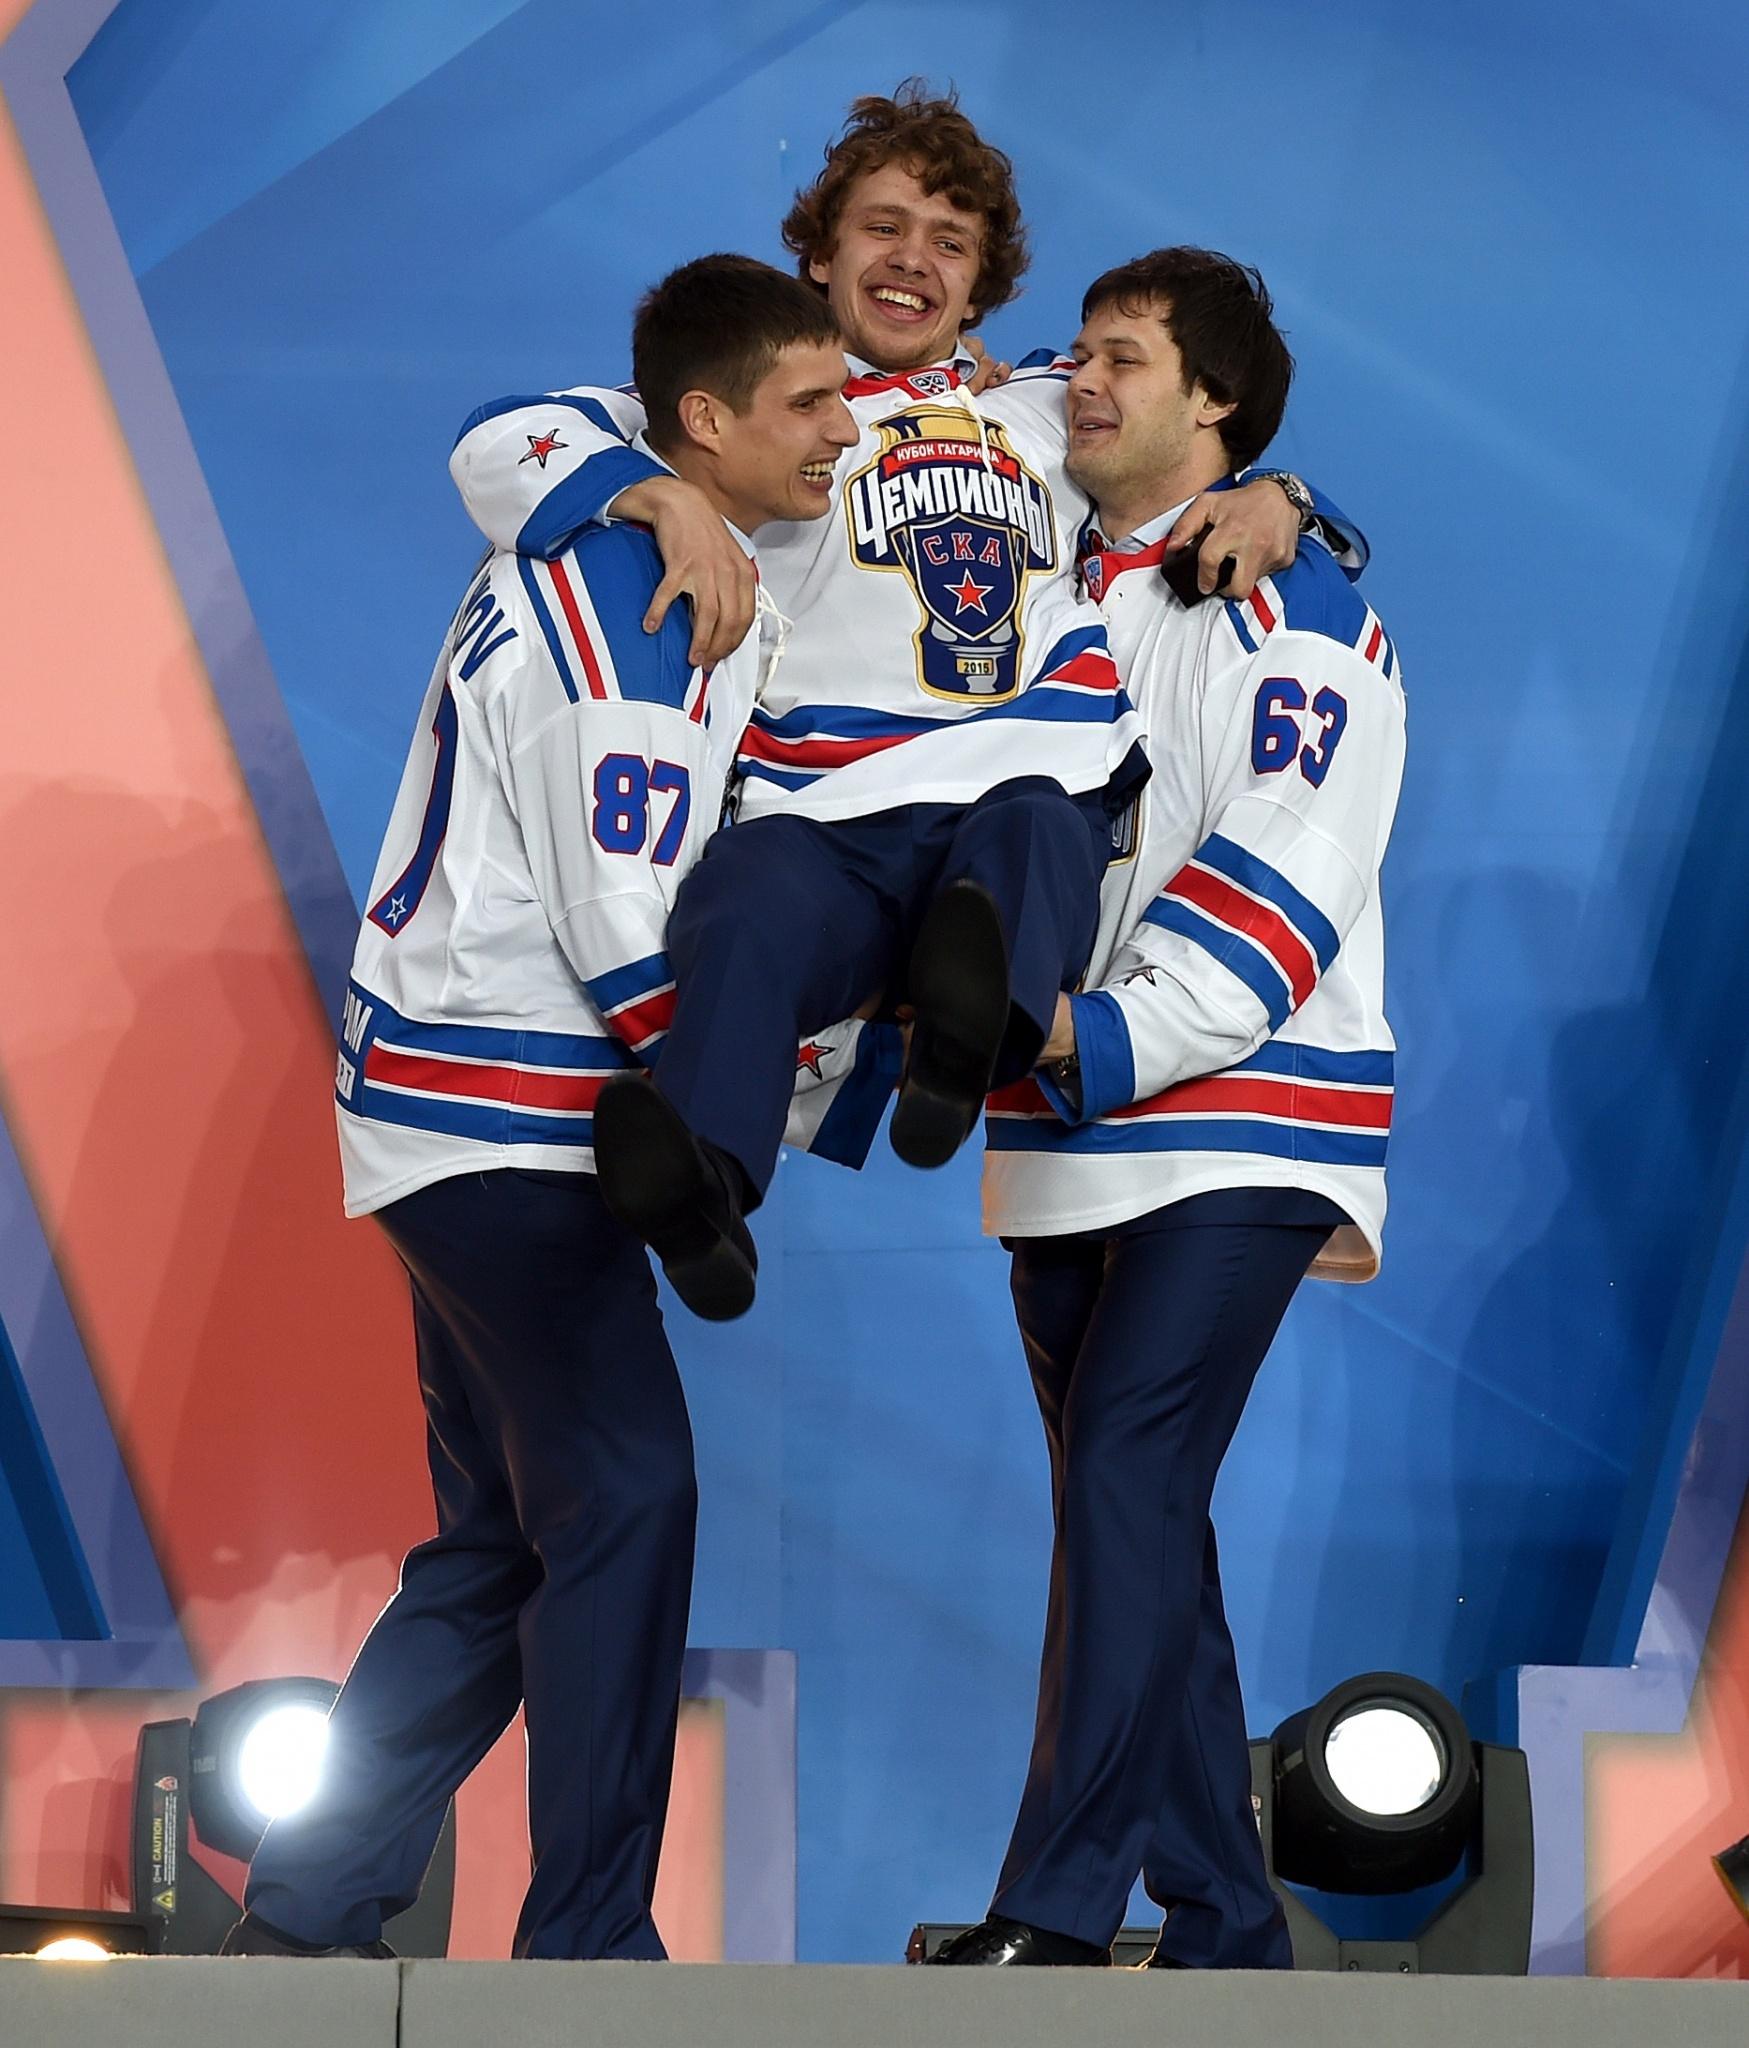 Вадим Шипачев, Артемий Панарин и Евгений Дадонов. Фото: Юрий Кузьмин